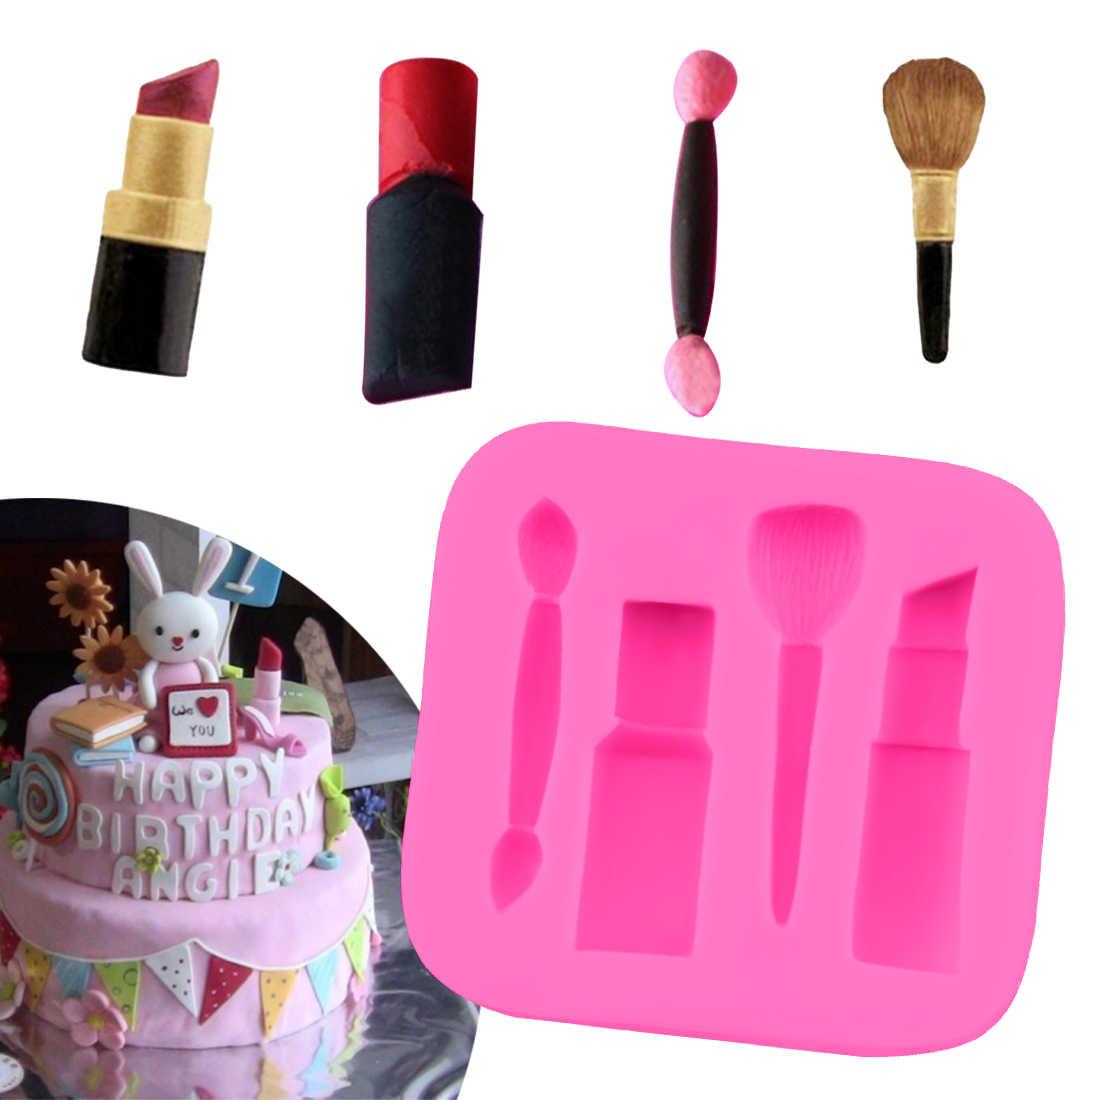 Pleasing Cake Decorating Tools 1Pc Makeup Tools Lipstick Nail Polish Funny Birthday Cards Online Inifodamsfinfo